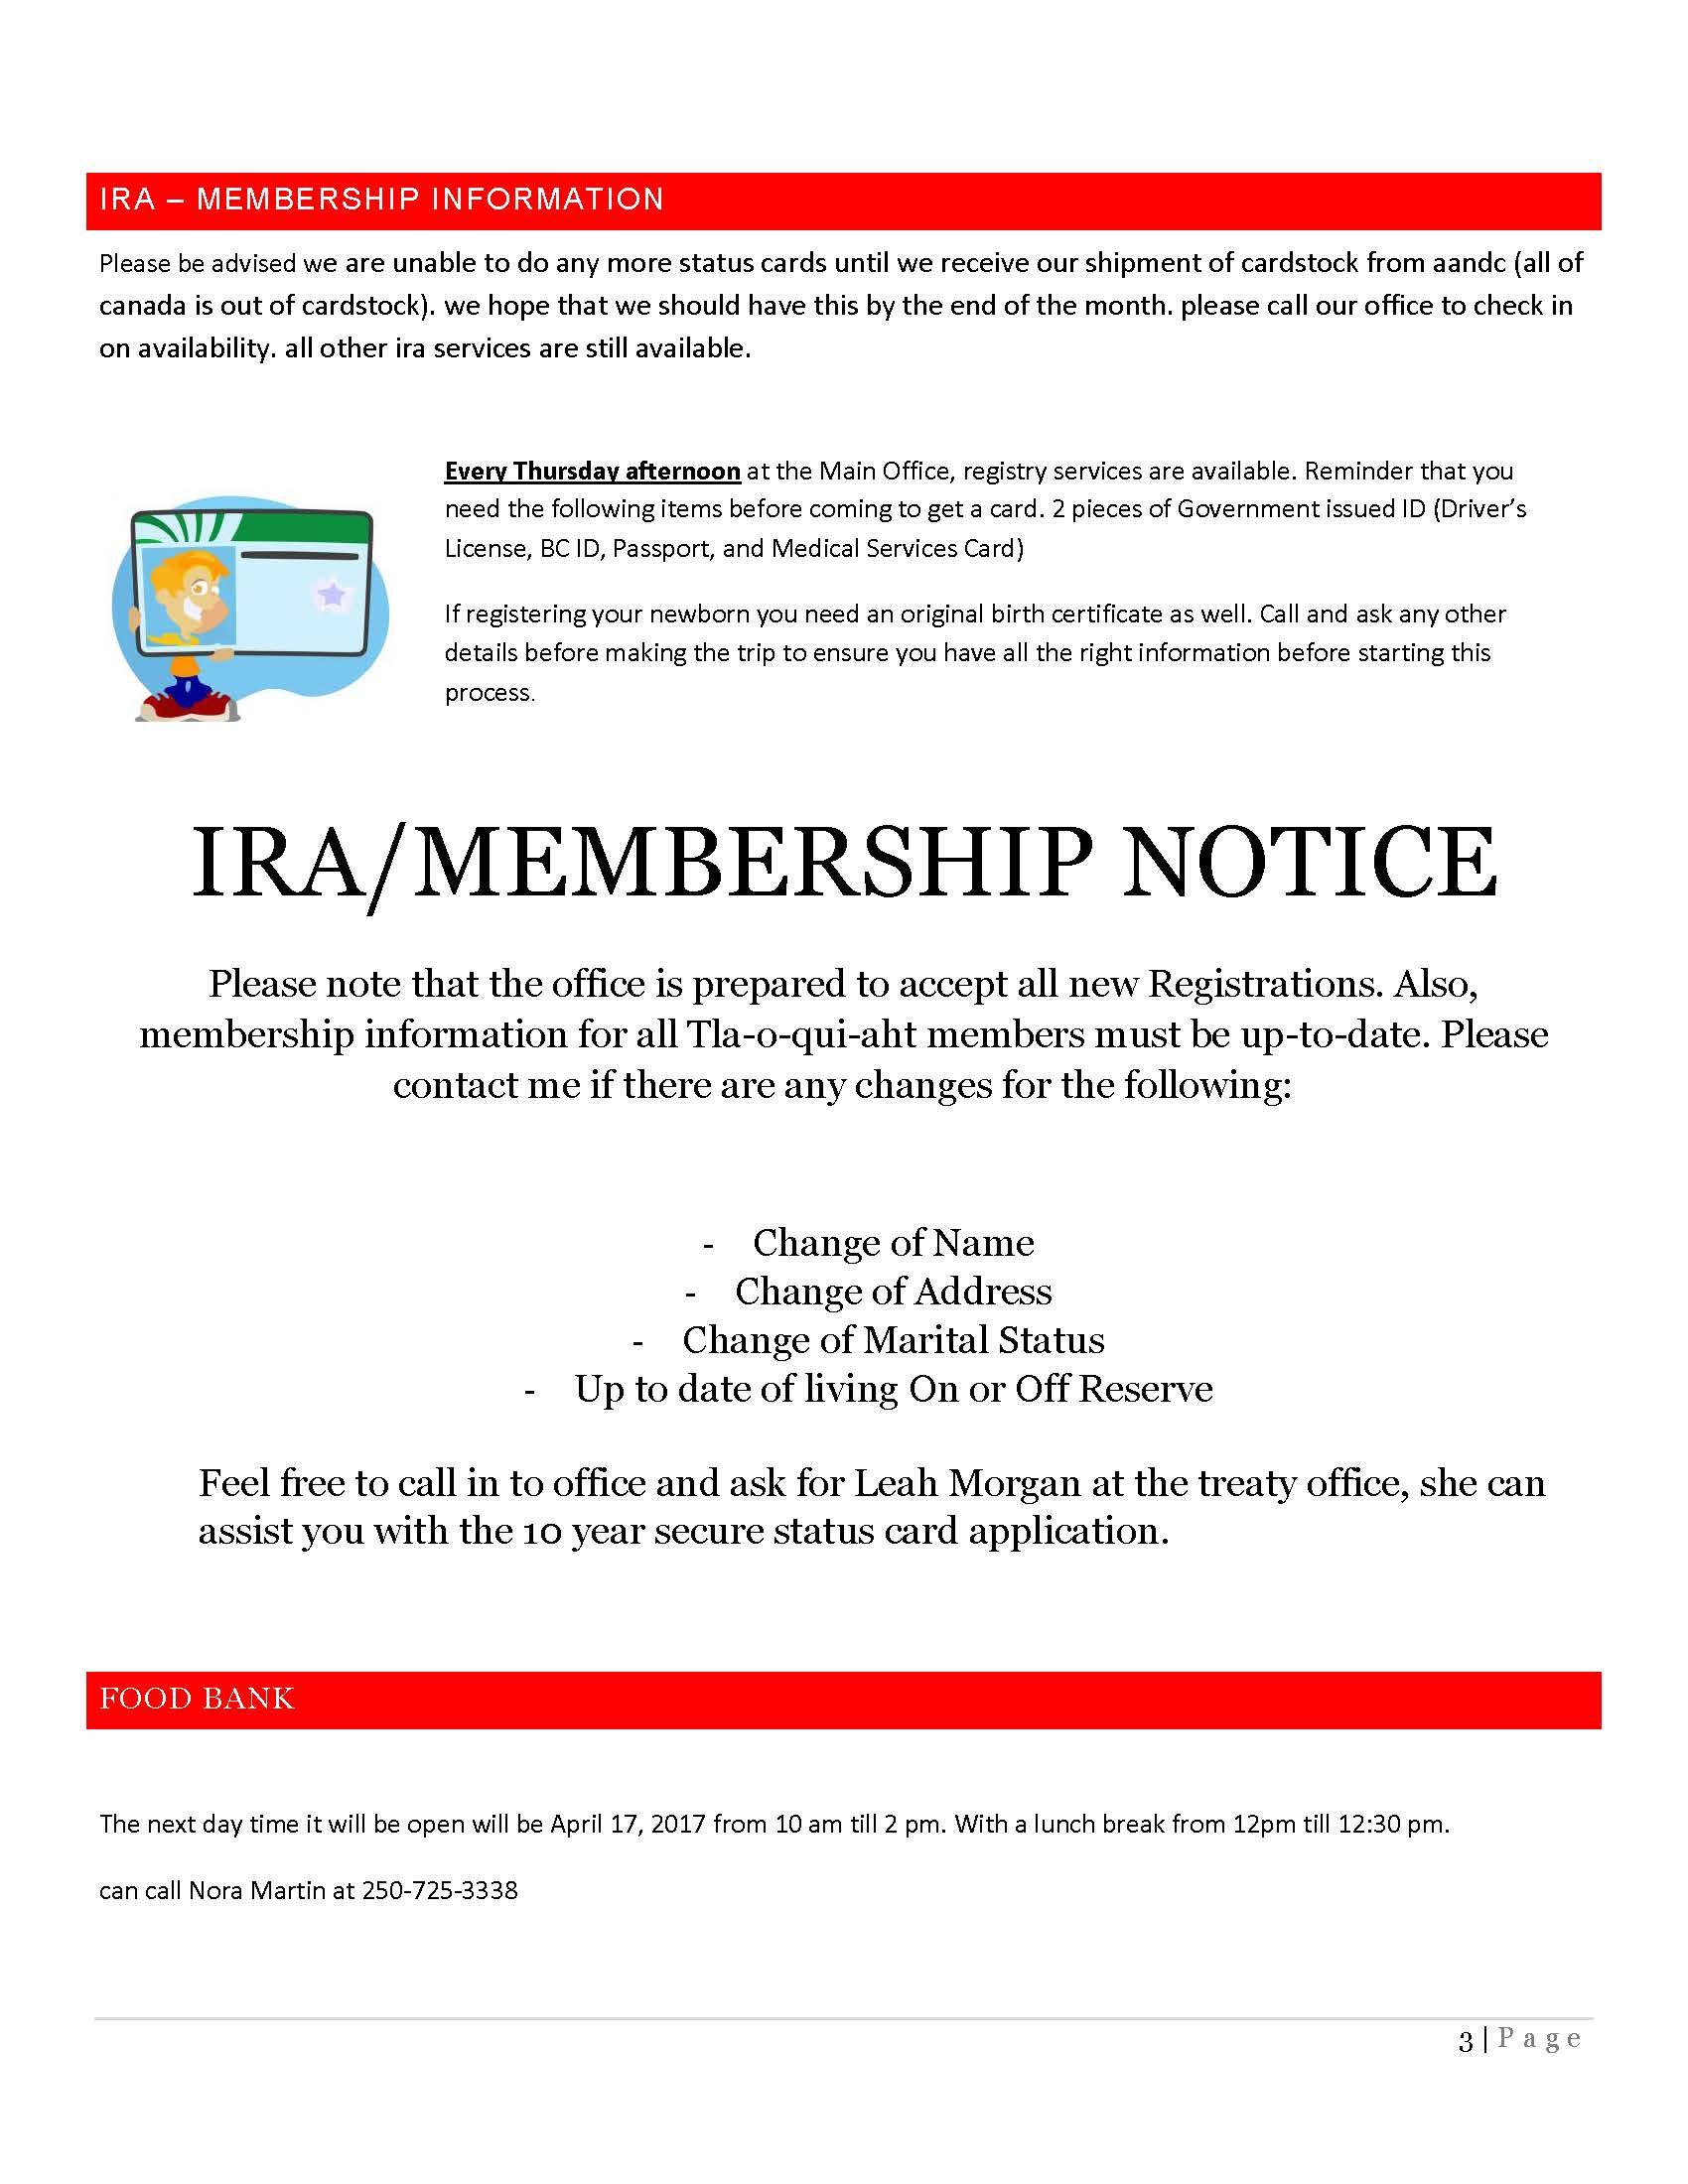 TFN Bulletin March 15-2017_Page_03.jpg